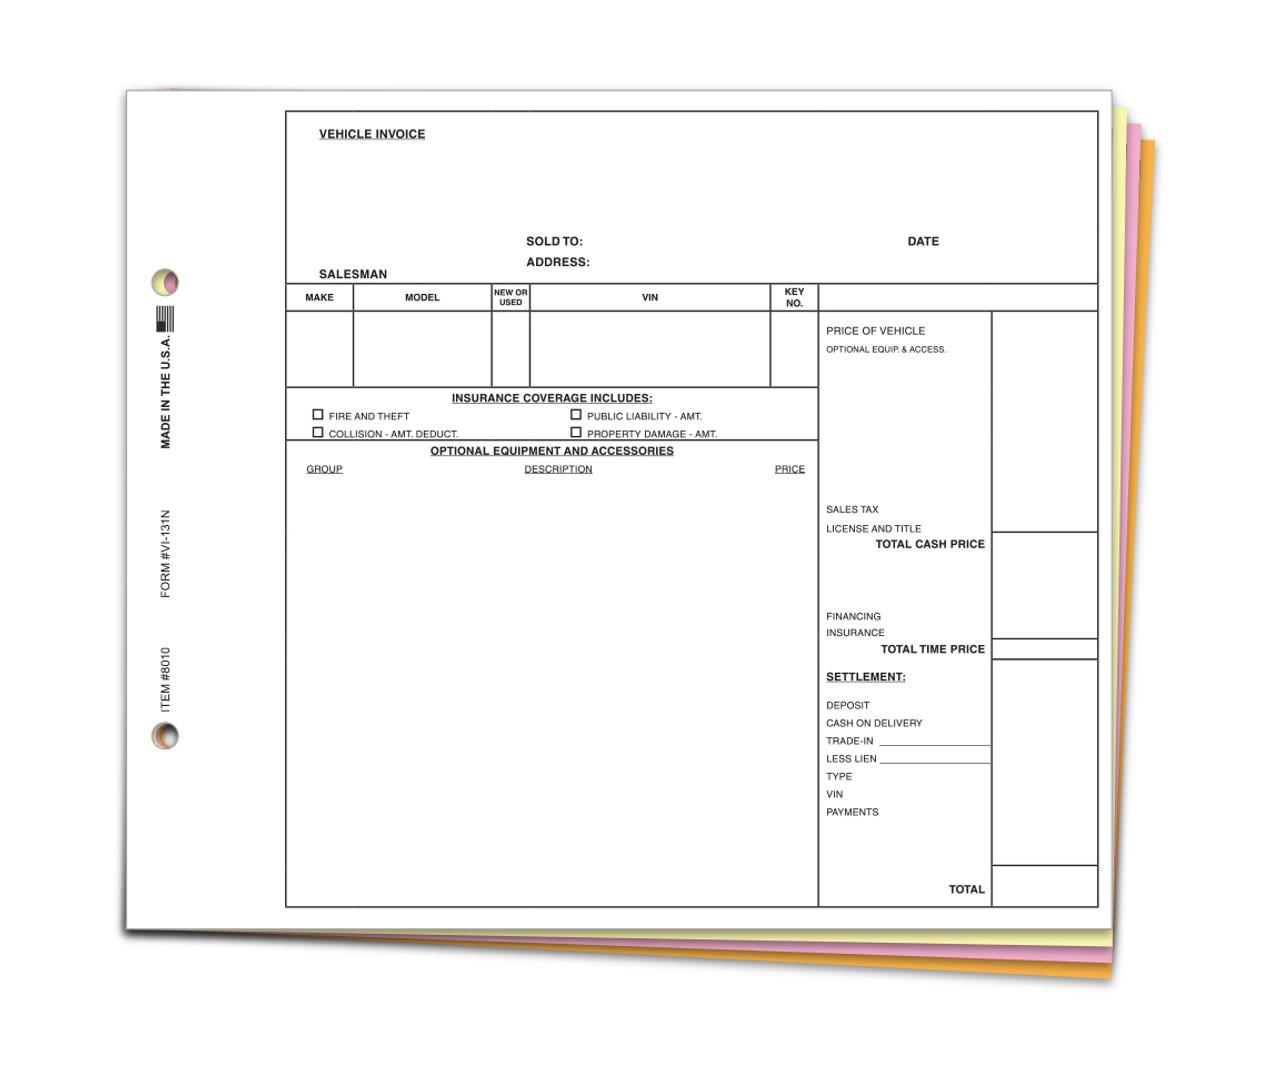 Vehicle Invoice Form #VI-131N Plain